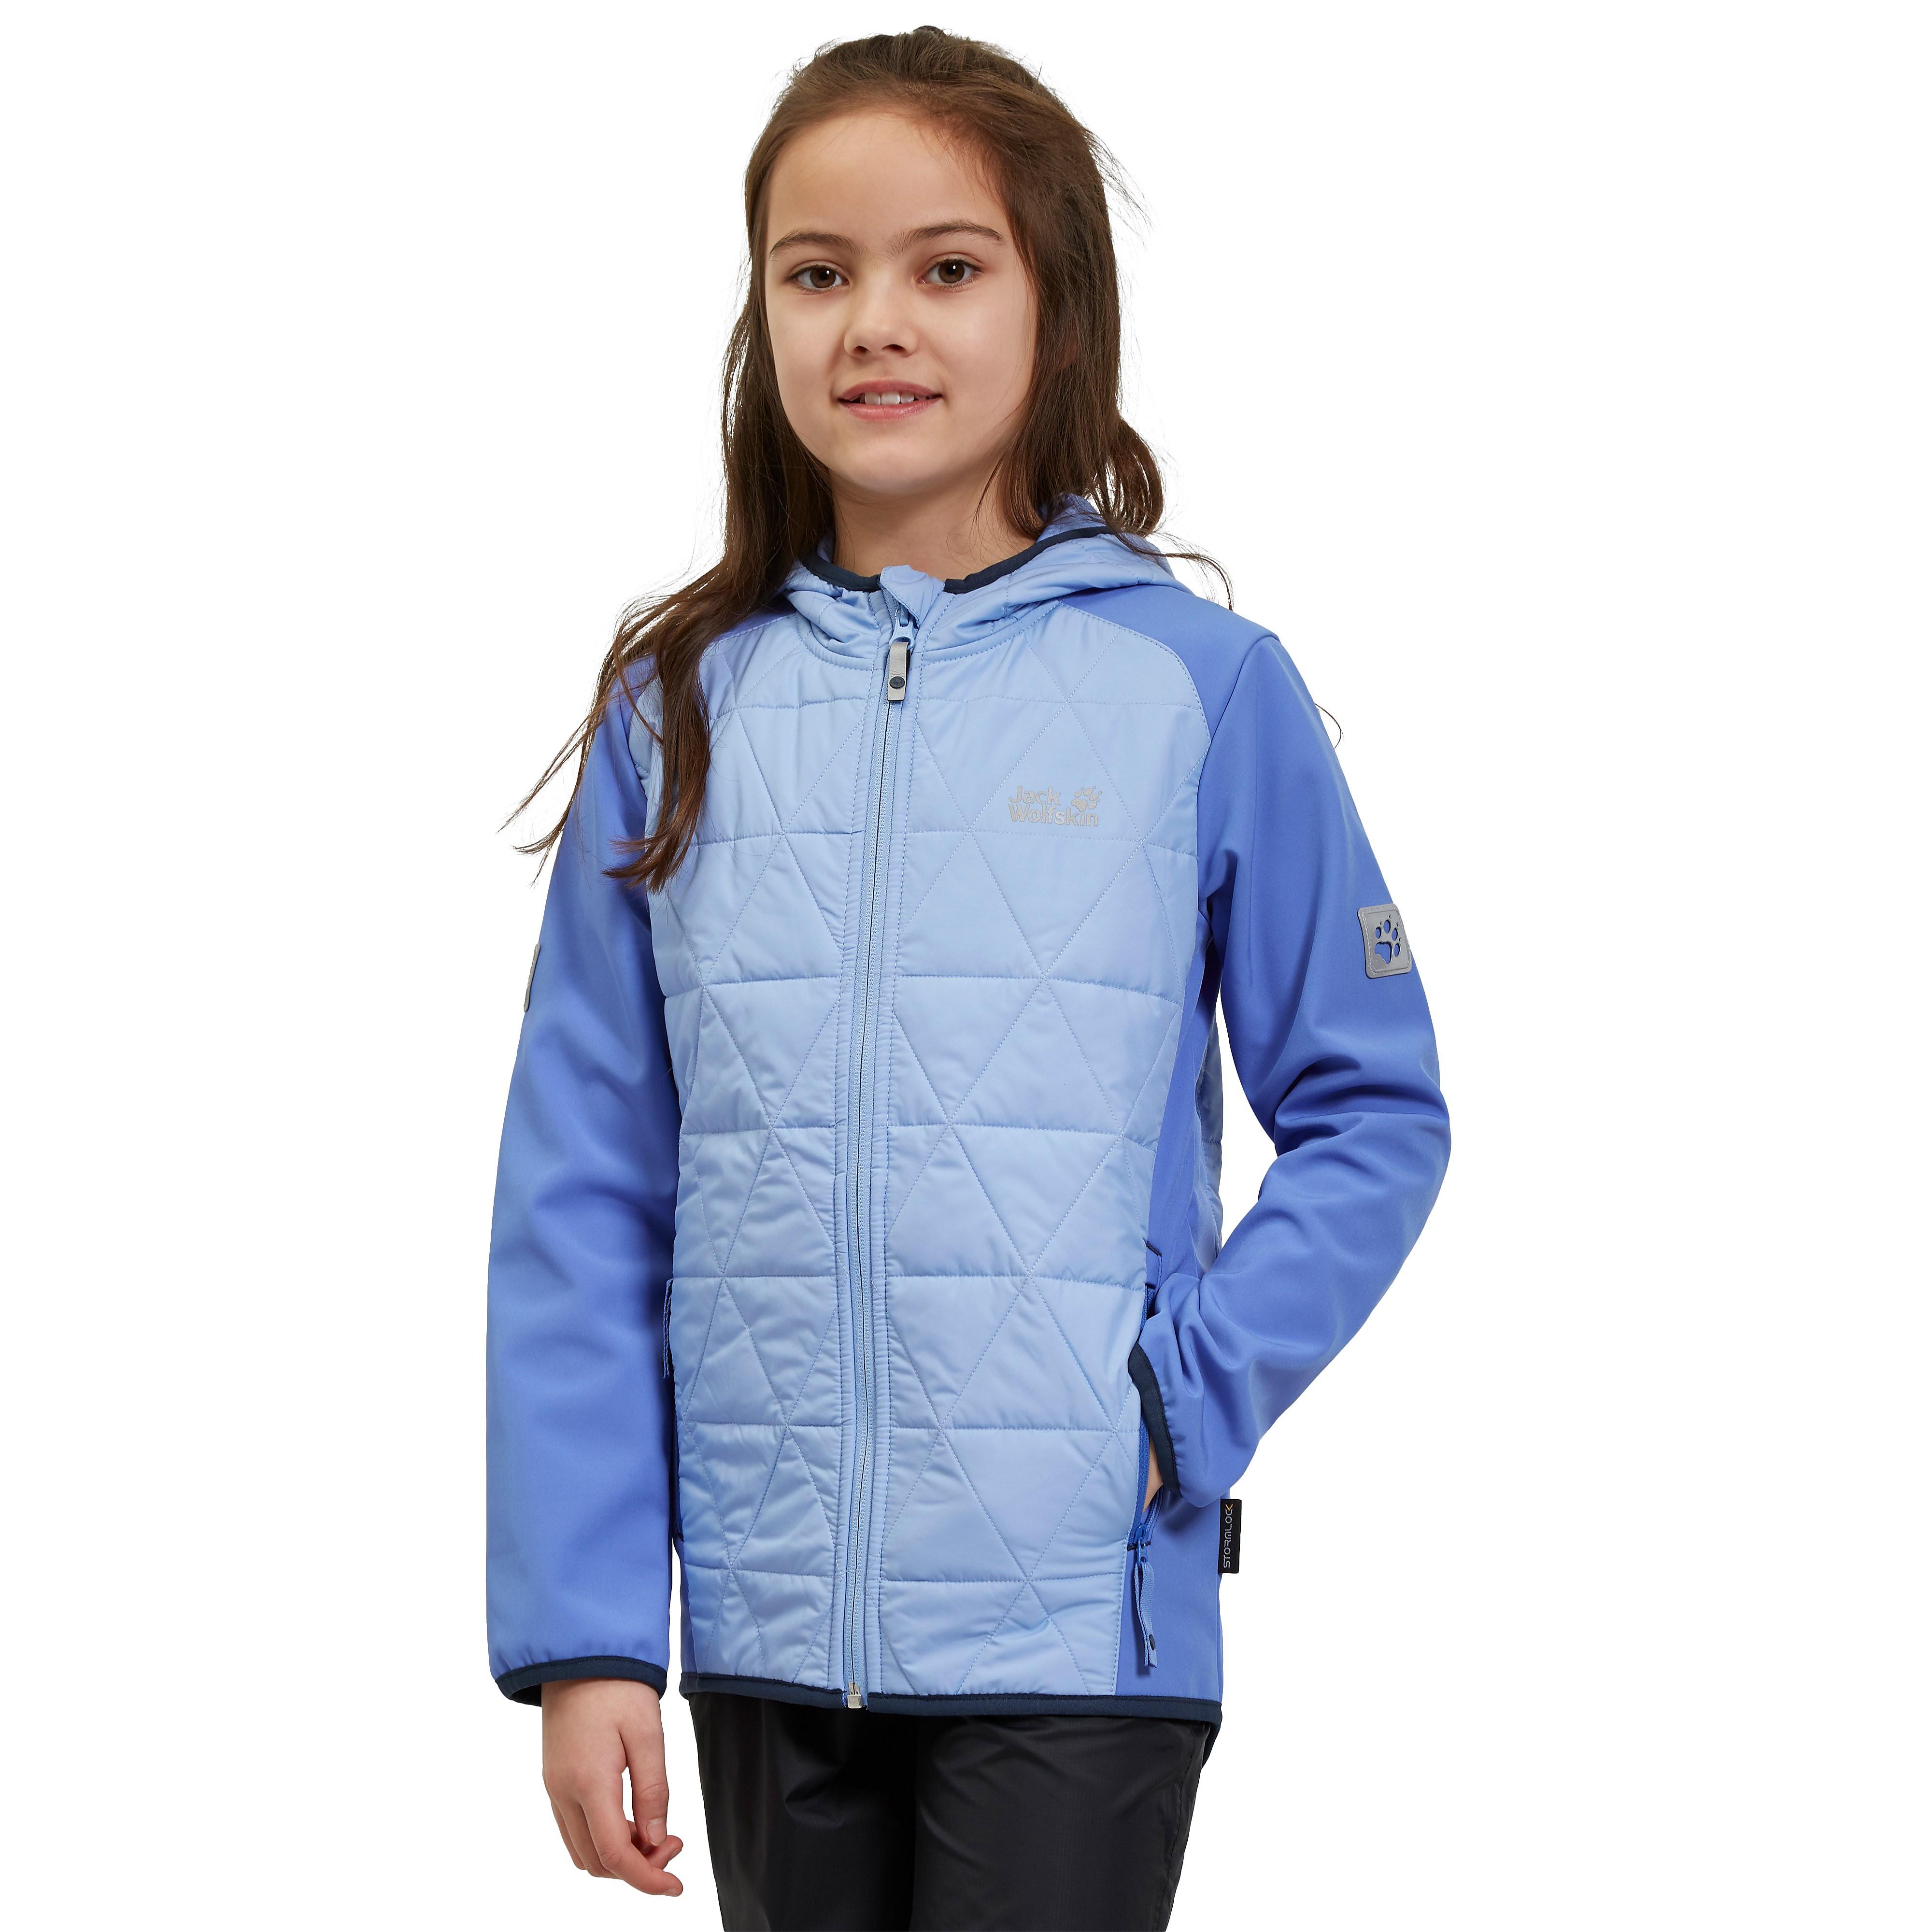 Jack Wolfskin Grassland Softshell Hybrid Junior Jacket